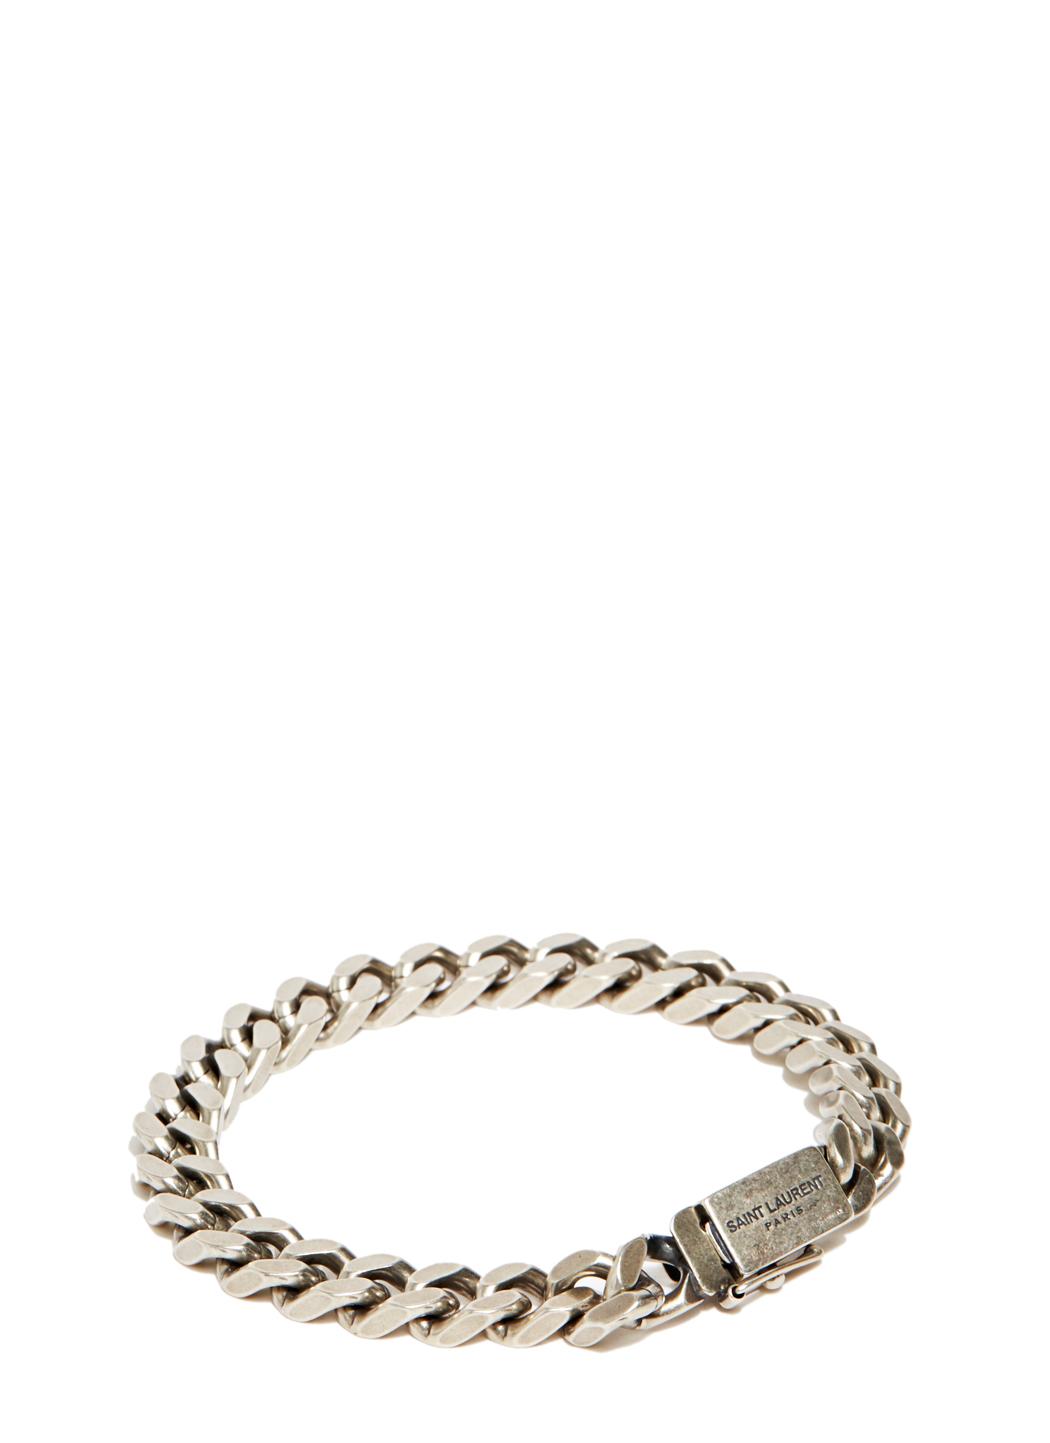 Saint Laurent Gourmette Silver Chain Bracelet In Metallic